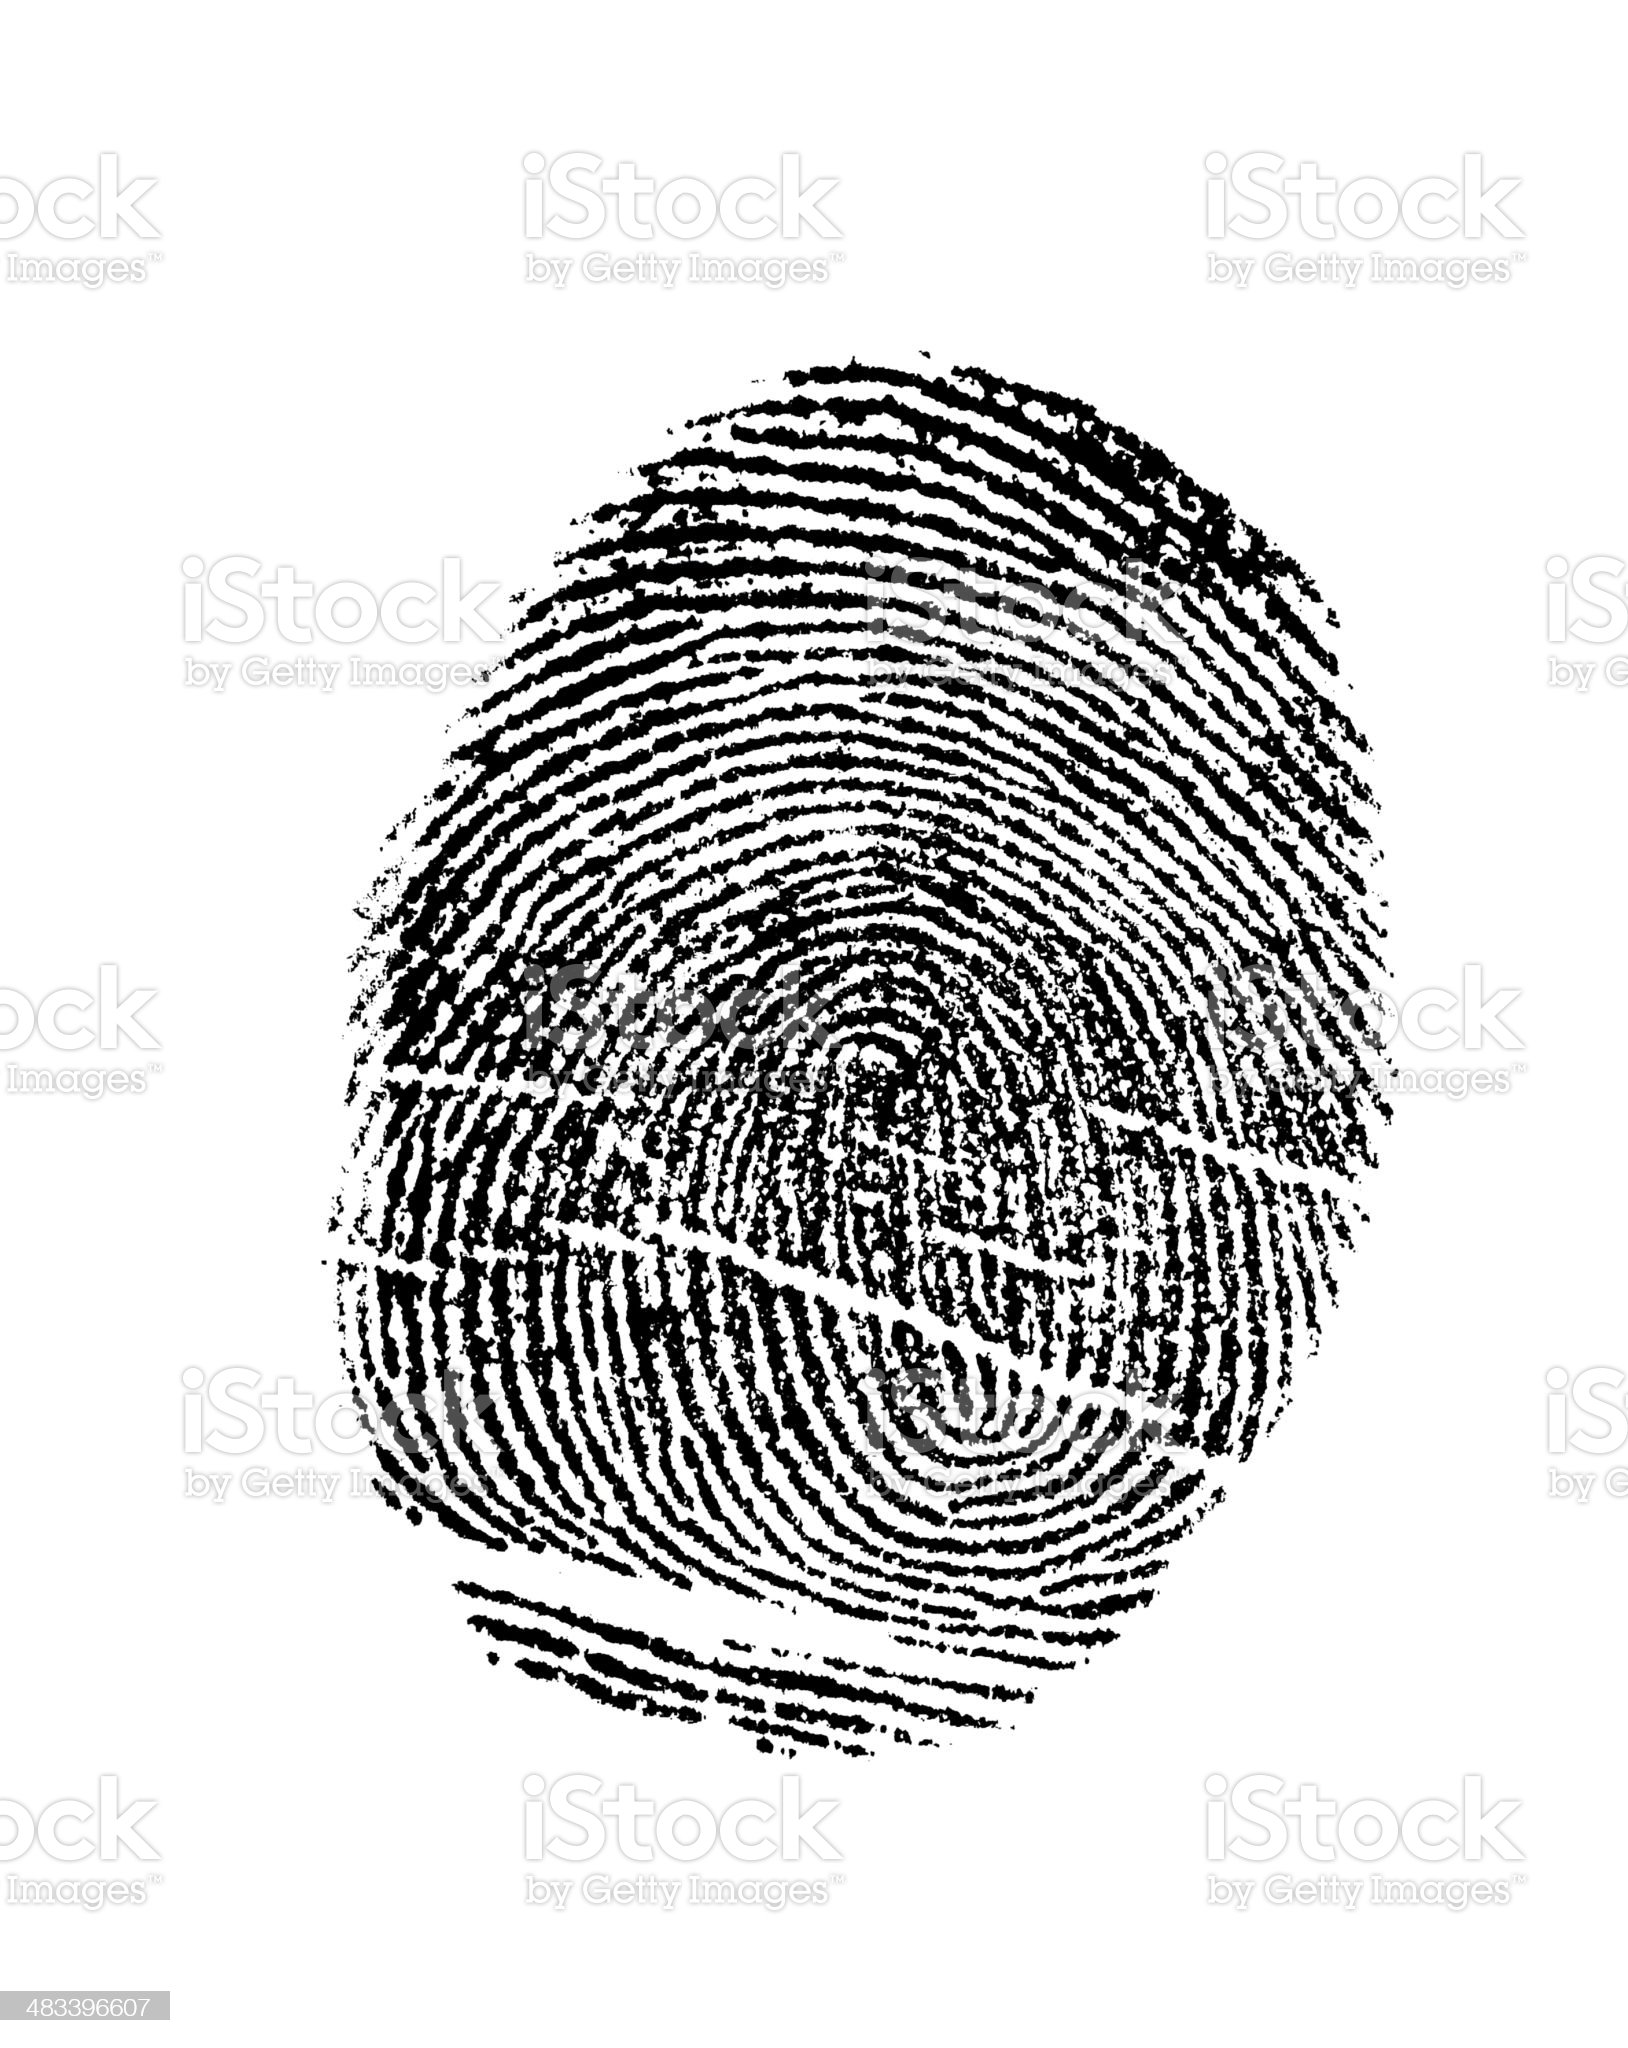 Finger Print royalty-free stock photo